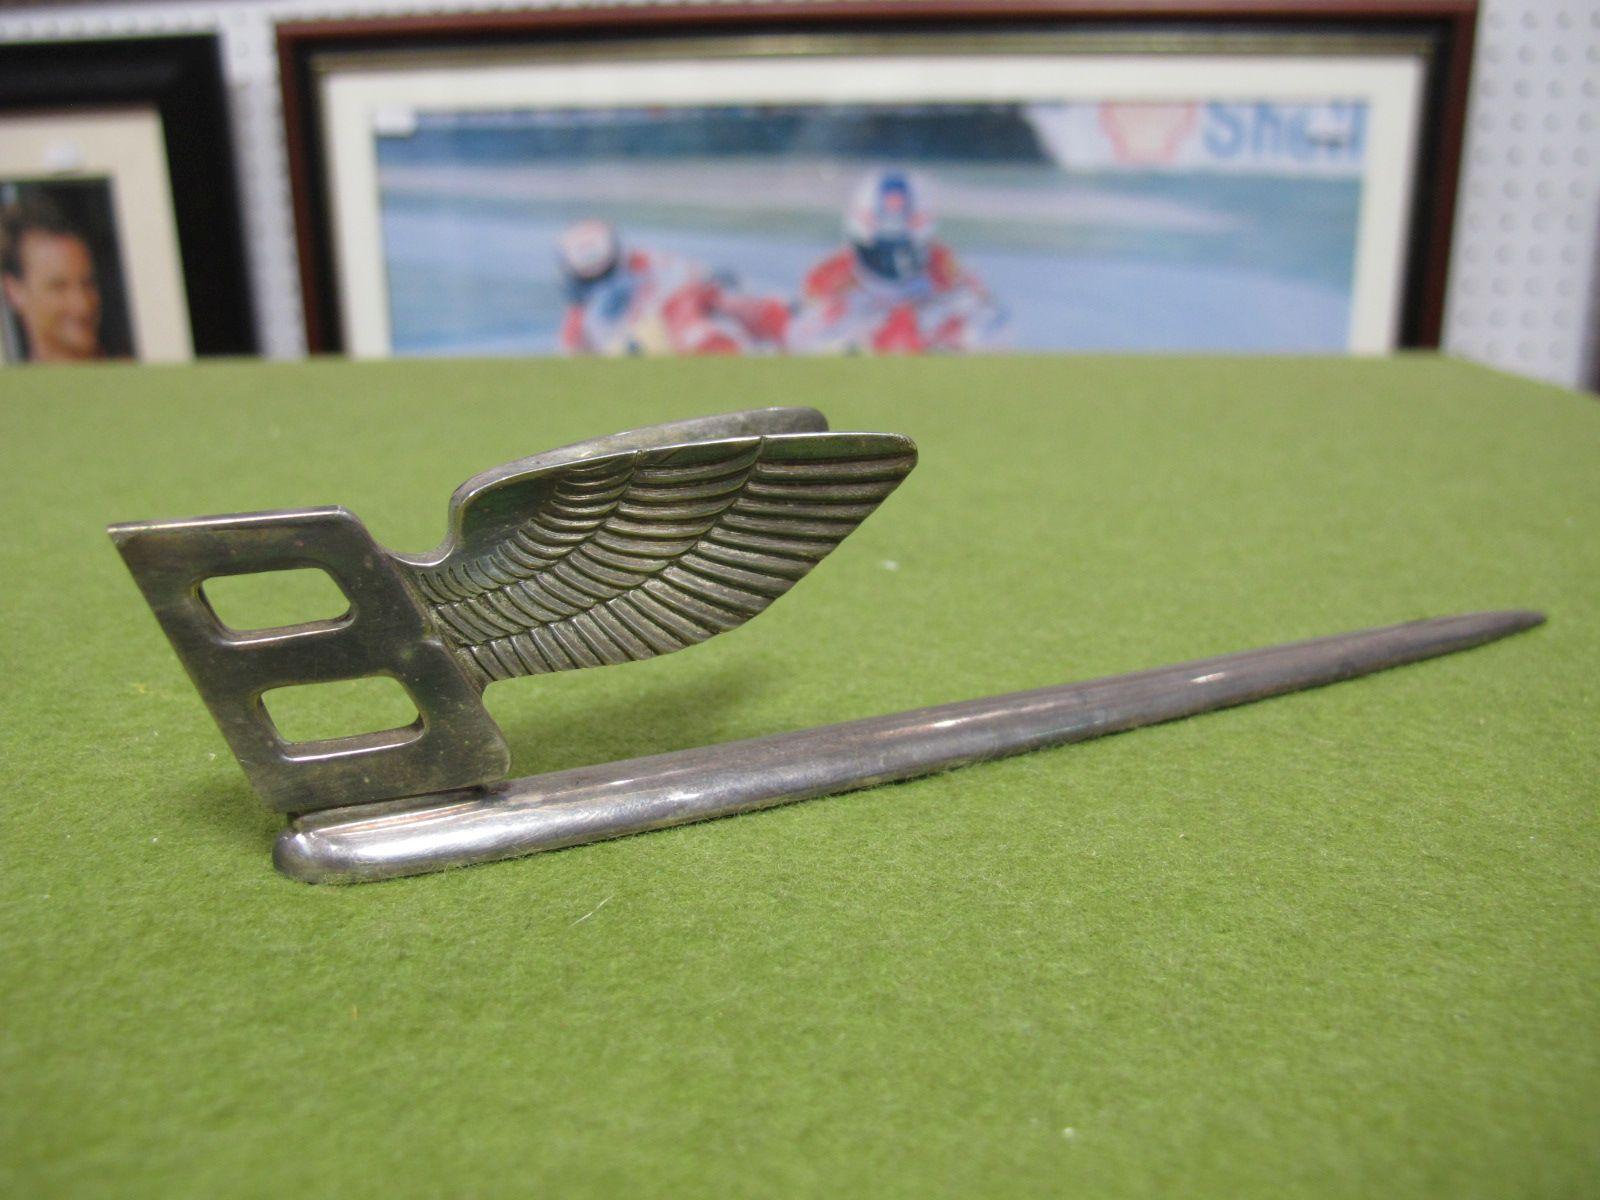 Lot 17 - A Modern White Metal Bentley Flying B Letter Opener.